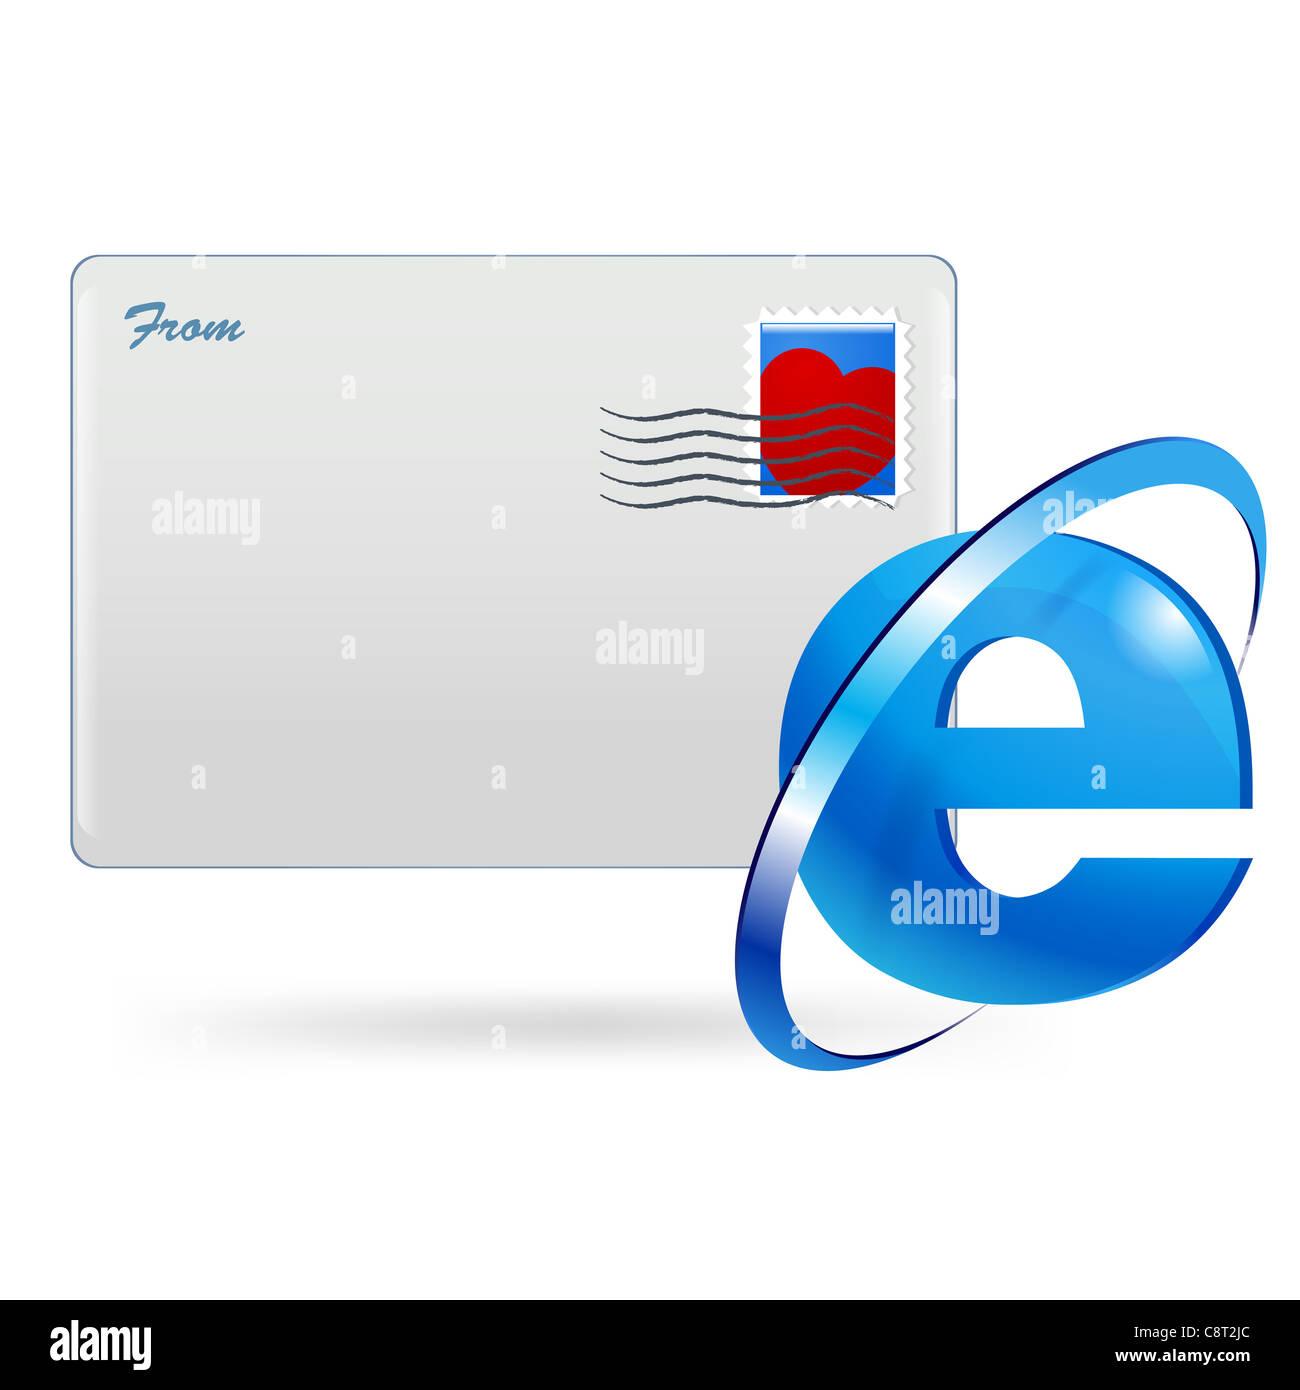 Illustration Of Internet Explorer Symbol And Envelope Stock Photo